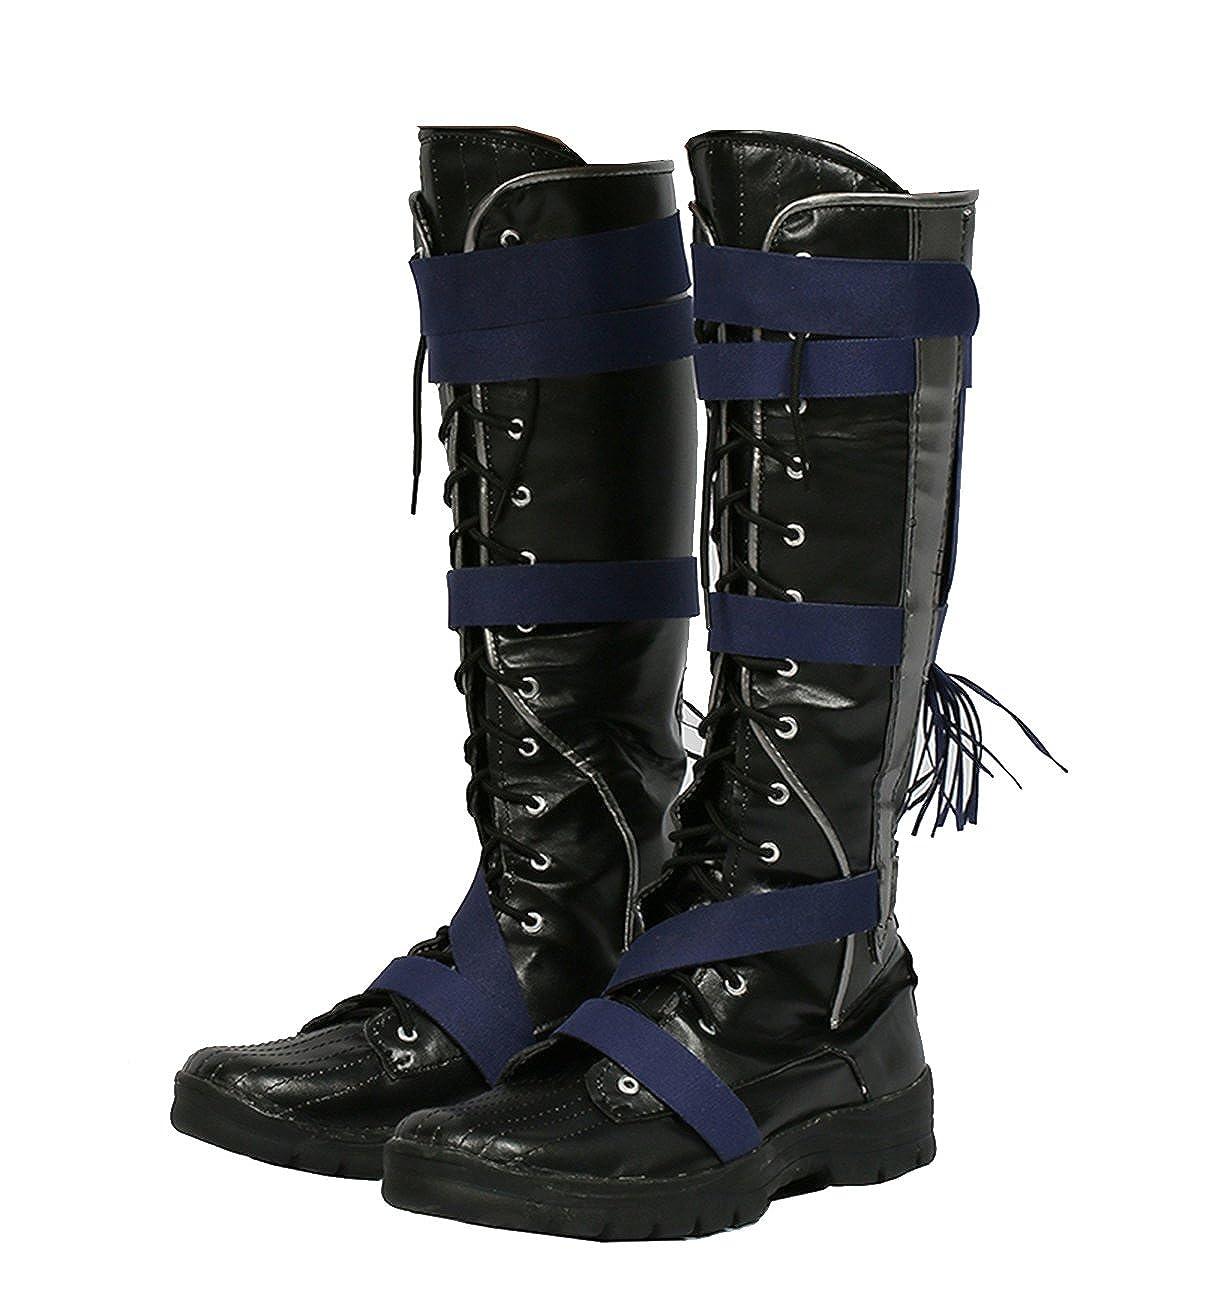 6bae86b0e056 Hot Movie Doctor Cosplay Strange Shoes Black PU Knee Boots Halloween